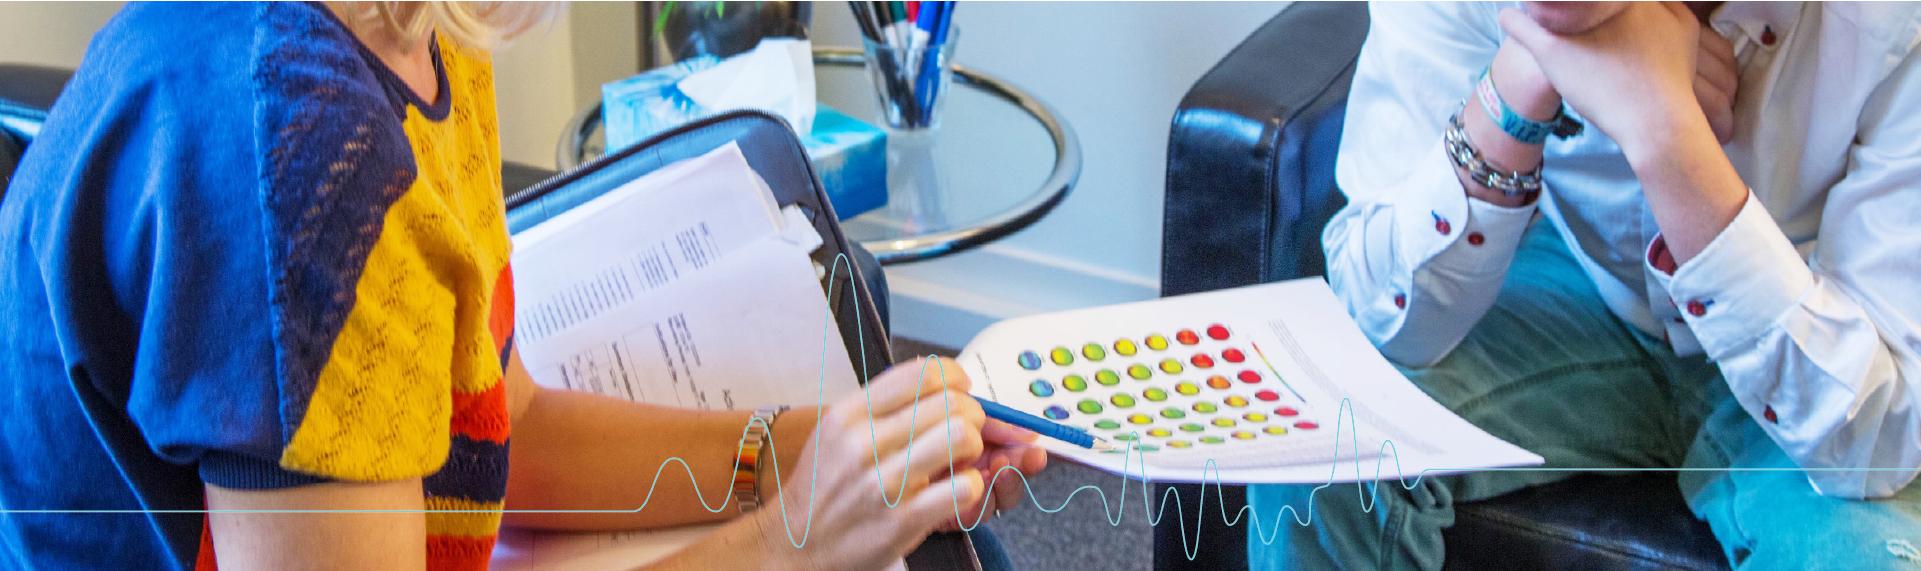 neuroCare Clinics - personalised QEEG assessment